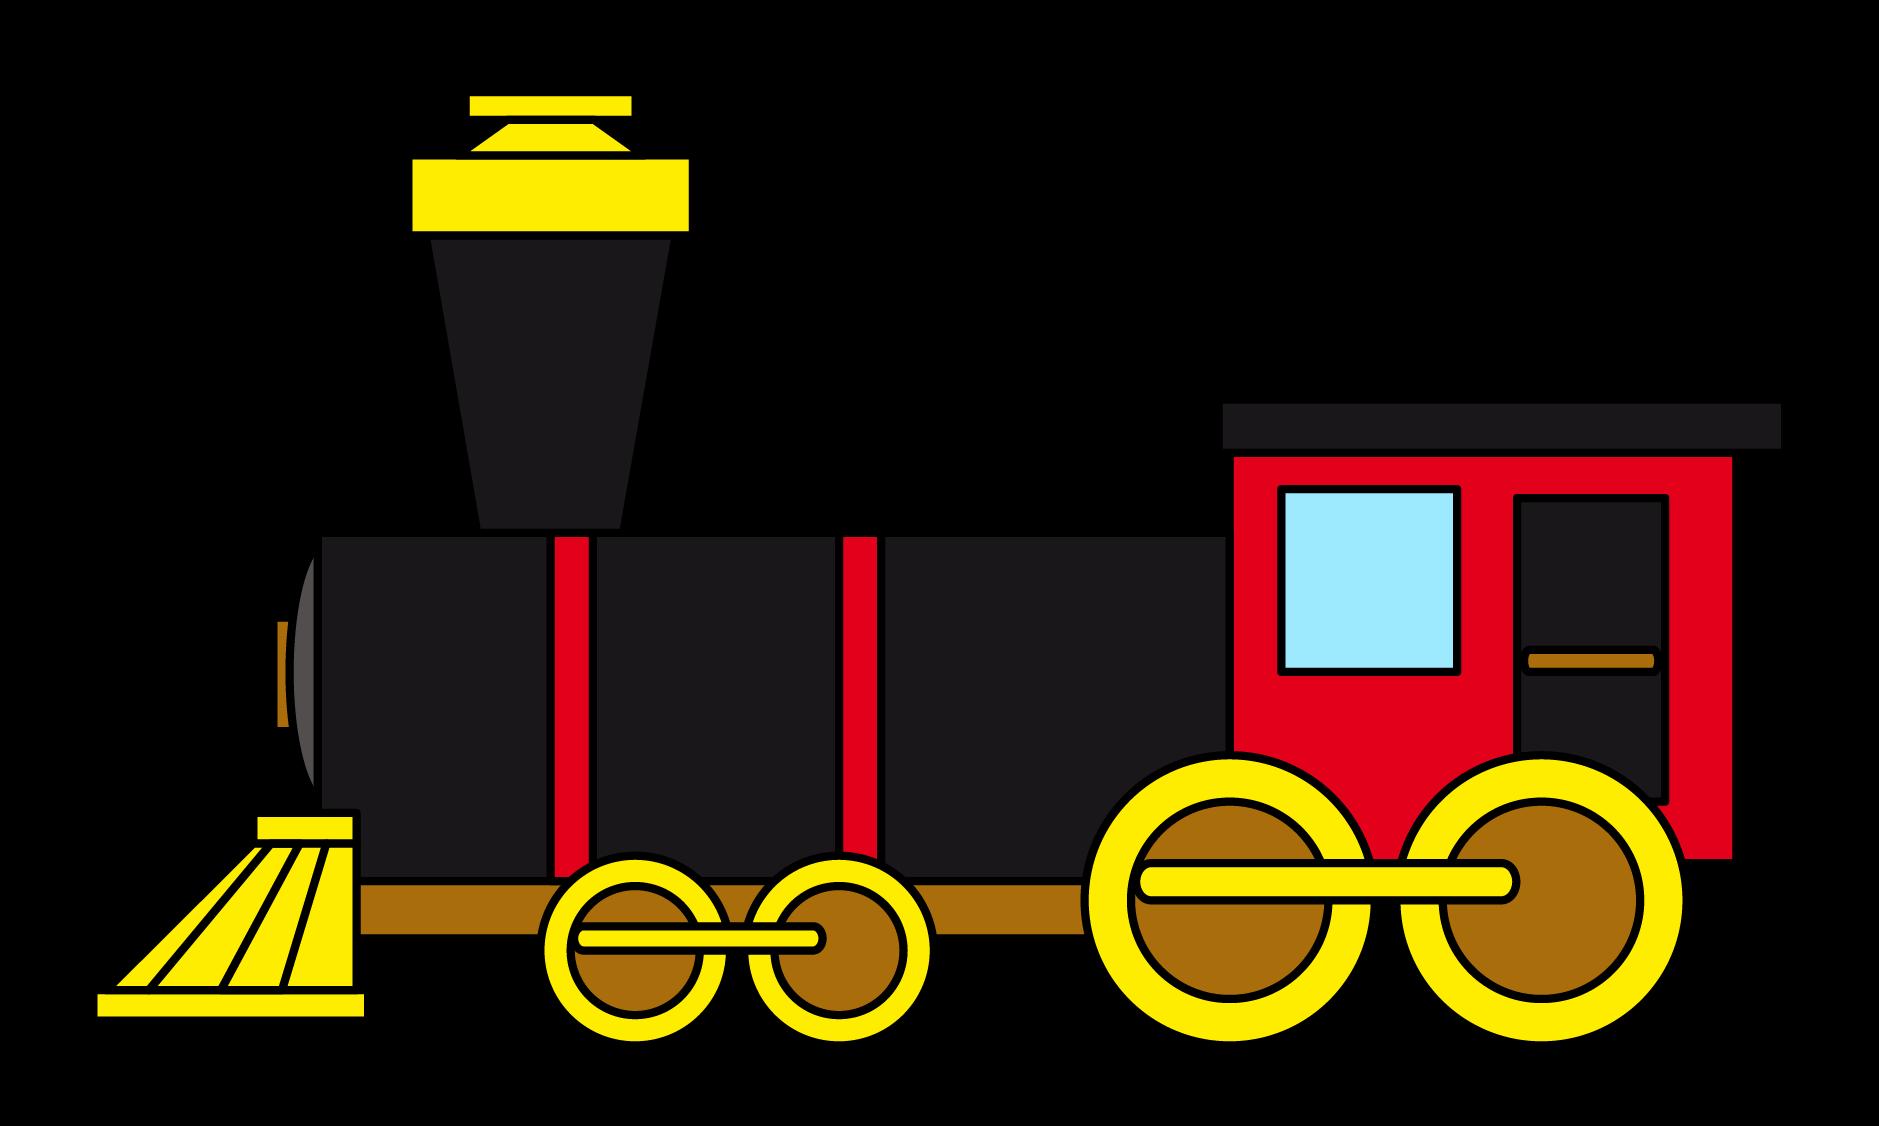 Steam Train Engine Clip Art Clipart Pand-Steam Train Engine Clip Art Clipart Panda Free Clipart Images-10